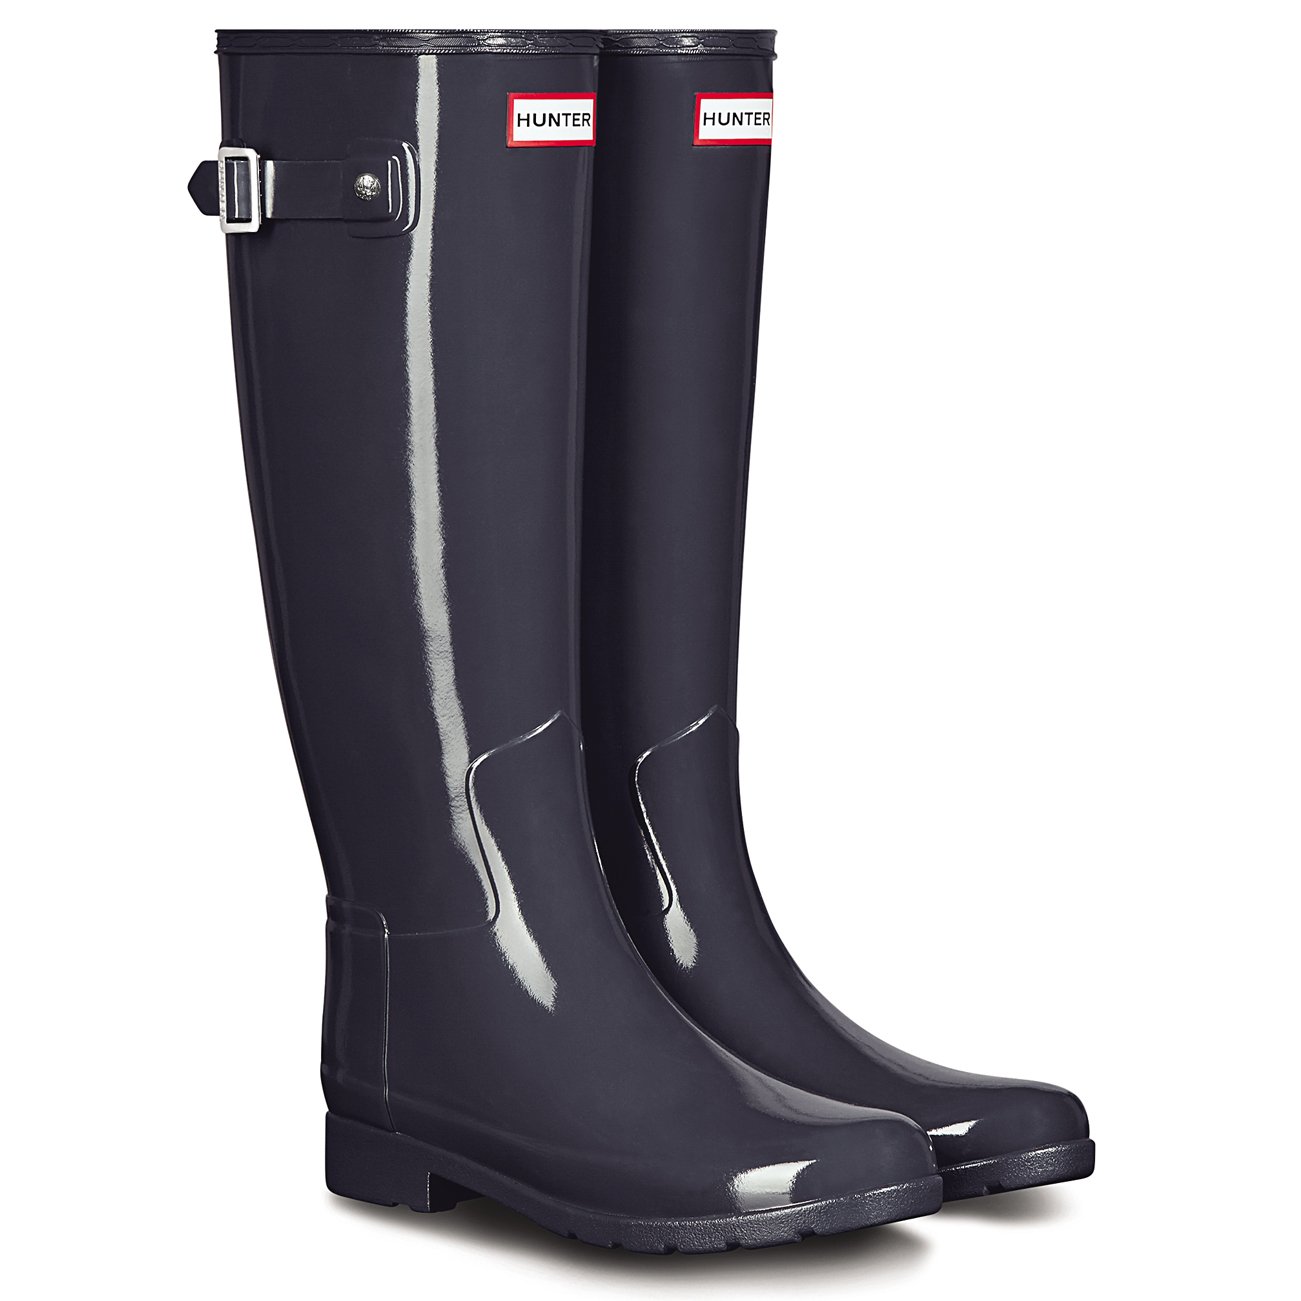 Brilliant Hunter Original Snow Quilt Boot Black - Womenu0026#39;s Wellies U0026 Country Boots - Womenu0026#39;s Footwear - Women